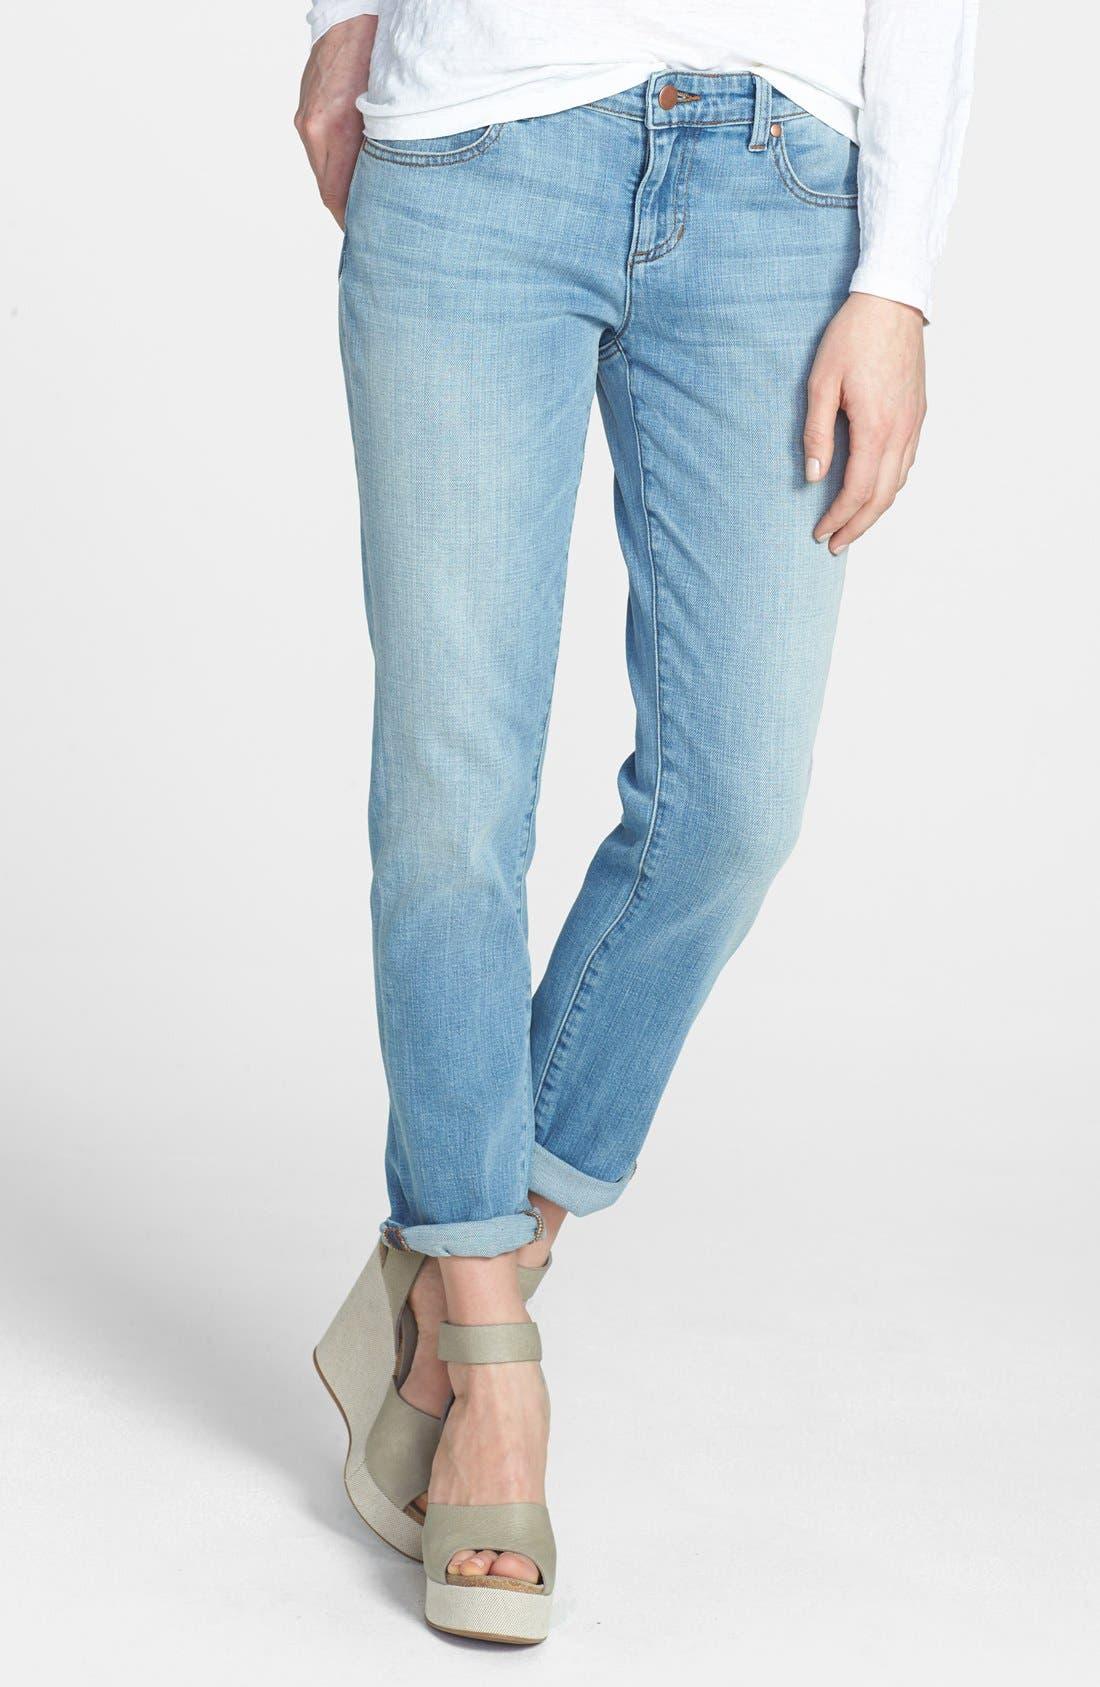 Alternate Image 1 Selected - Eileen Fisher Boyfriend Jeans (Regular & Petite)